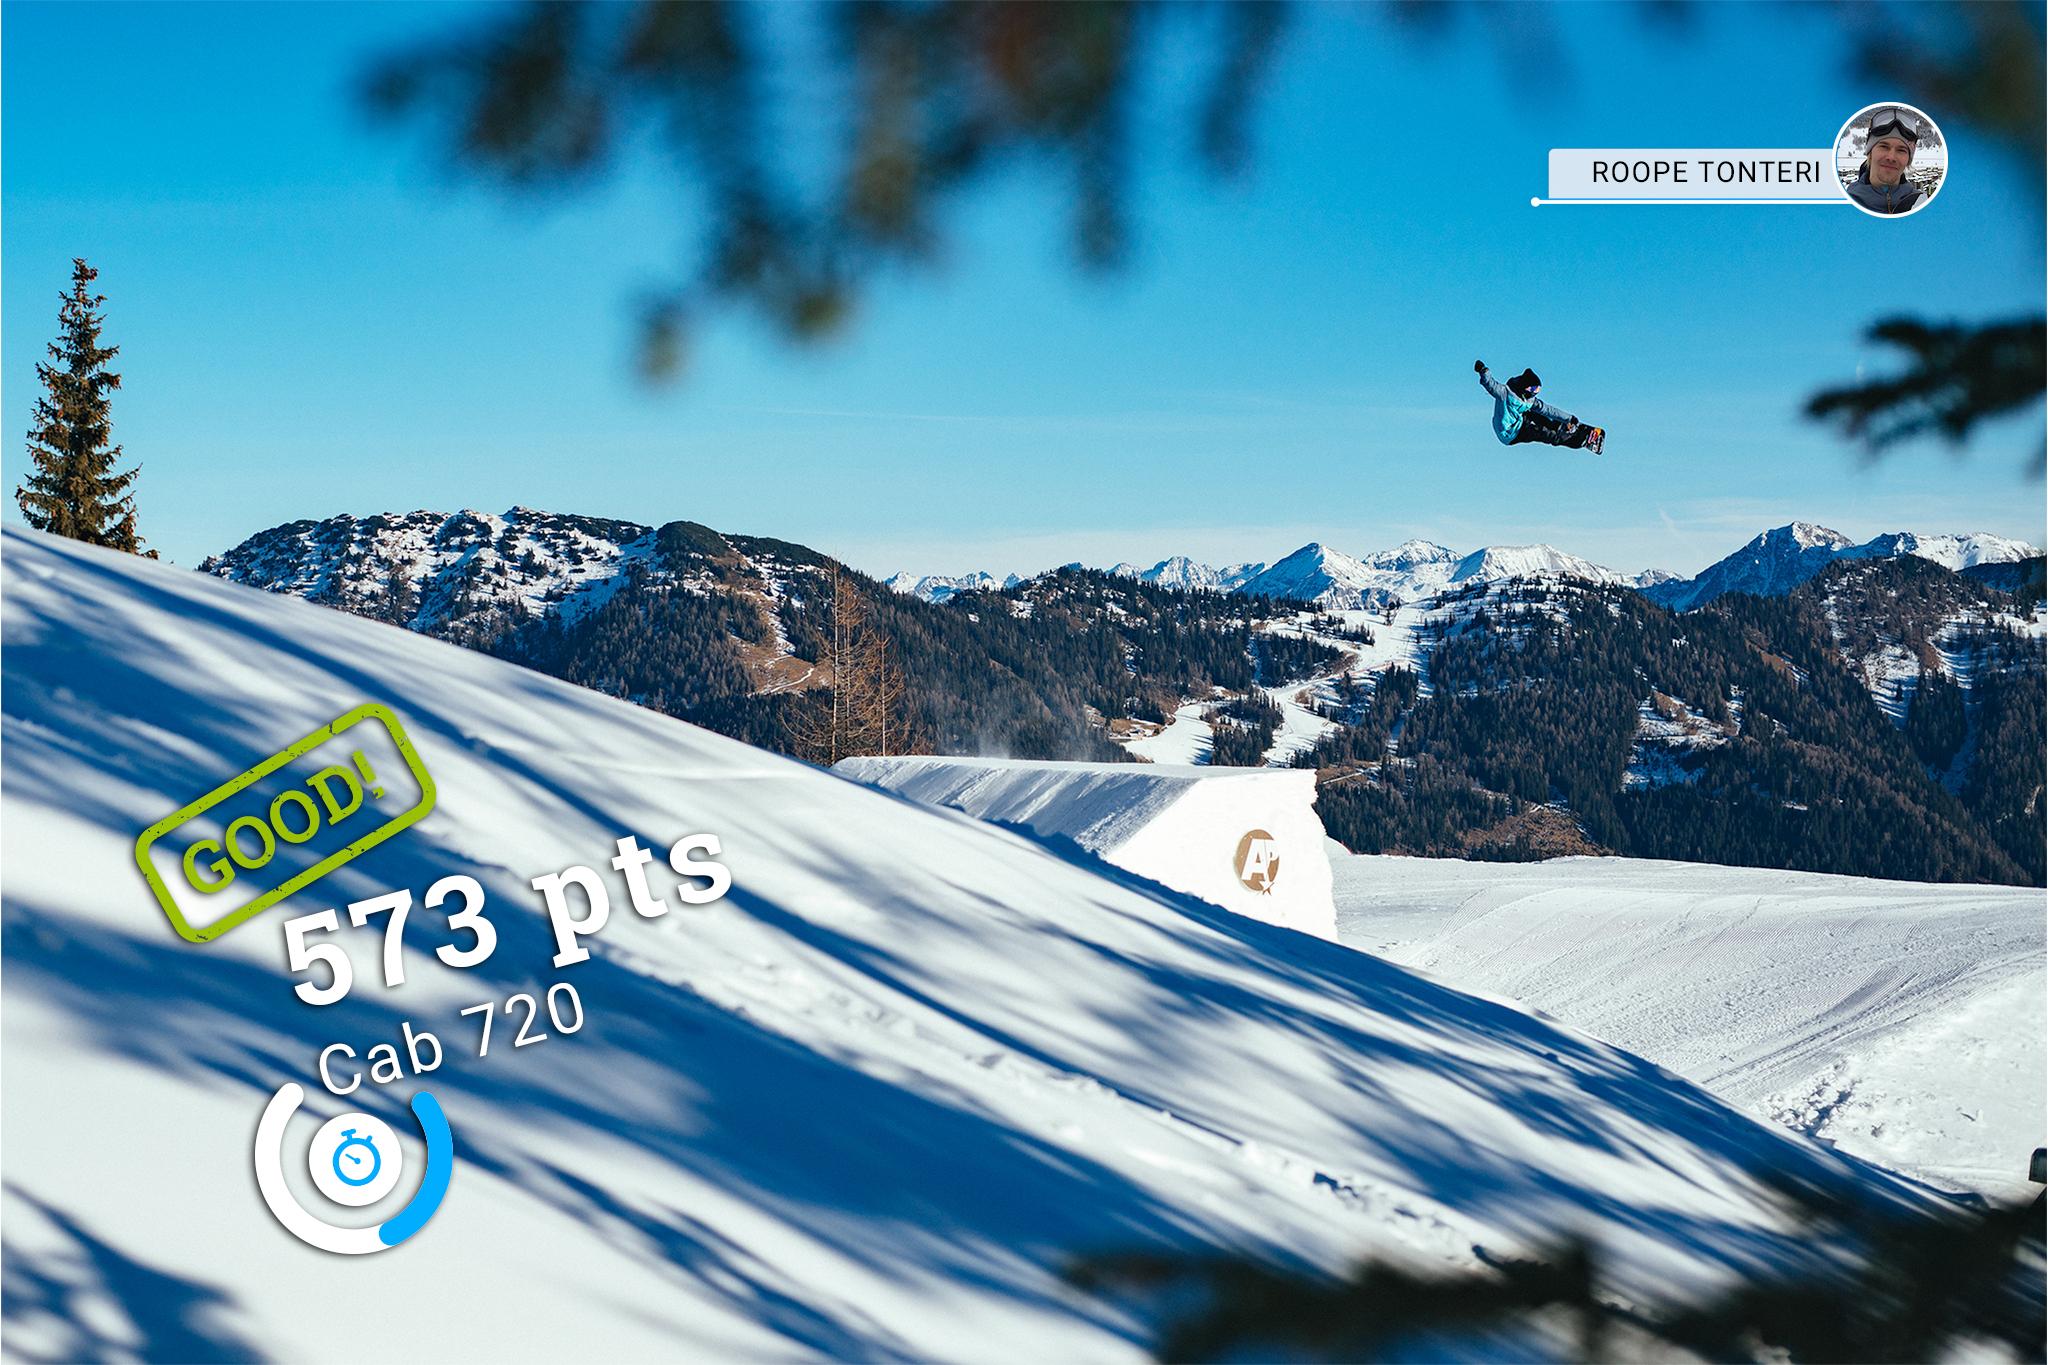 woo_snow_overlay_snowboard_2048.jpg